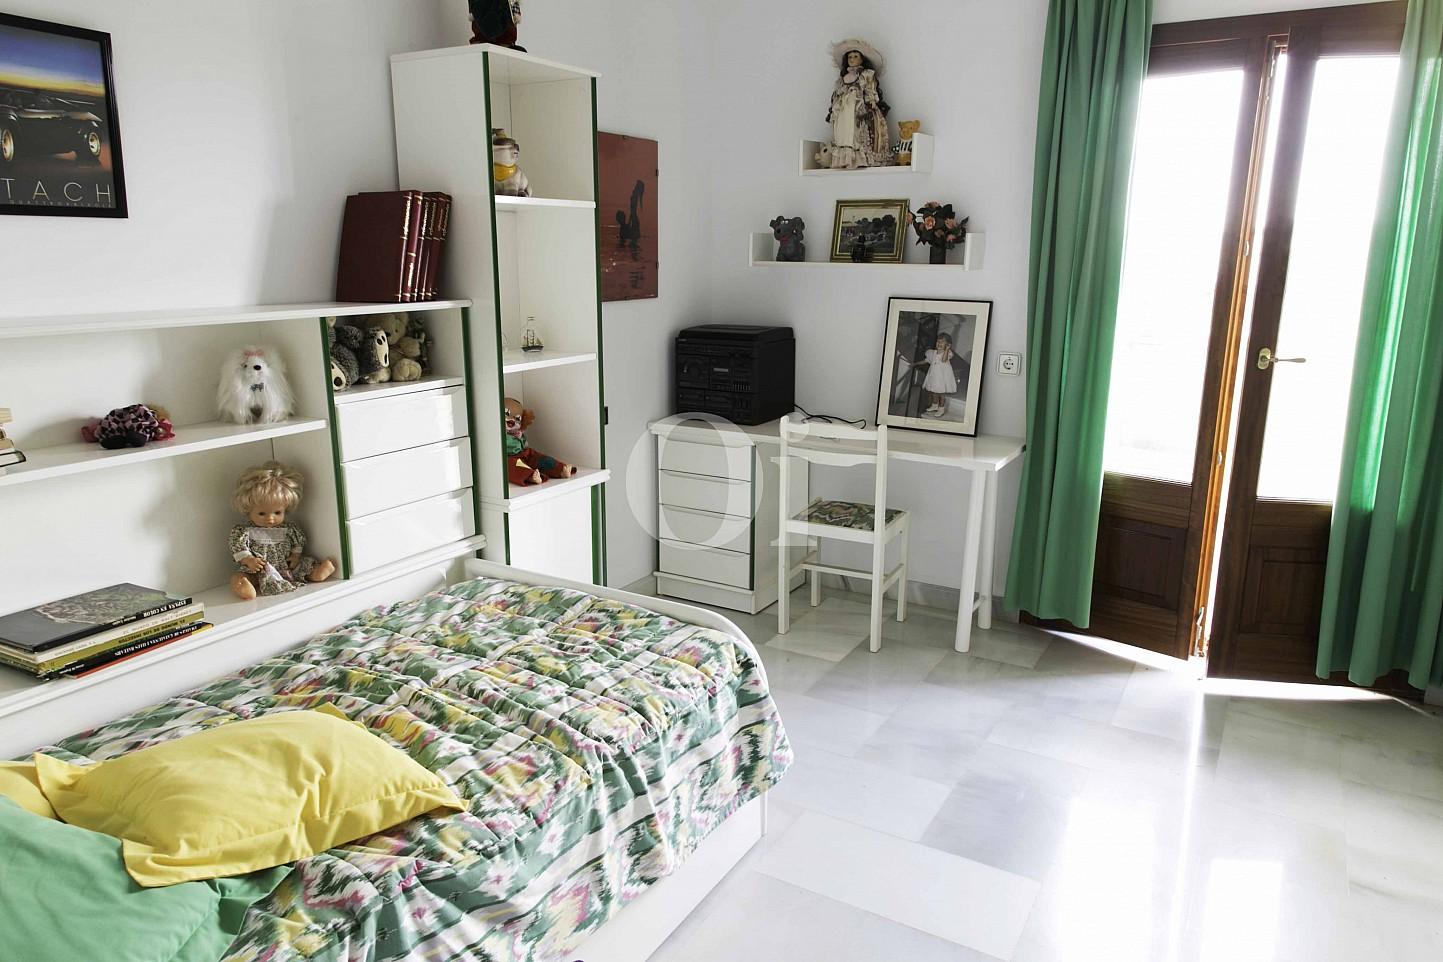 Habitación individual de lujosa villa en venta en San Lorenzo, Mallorca